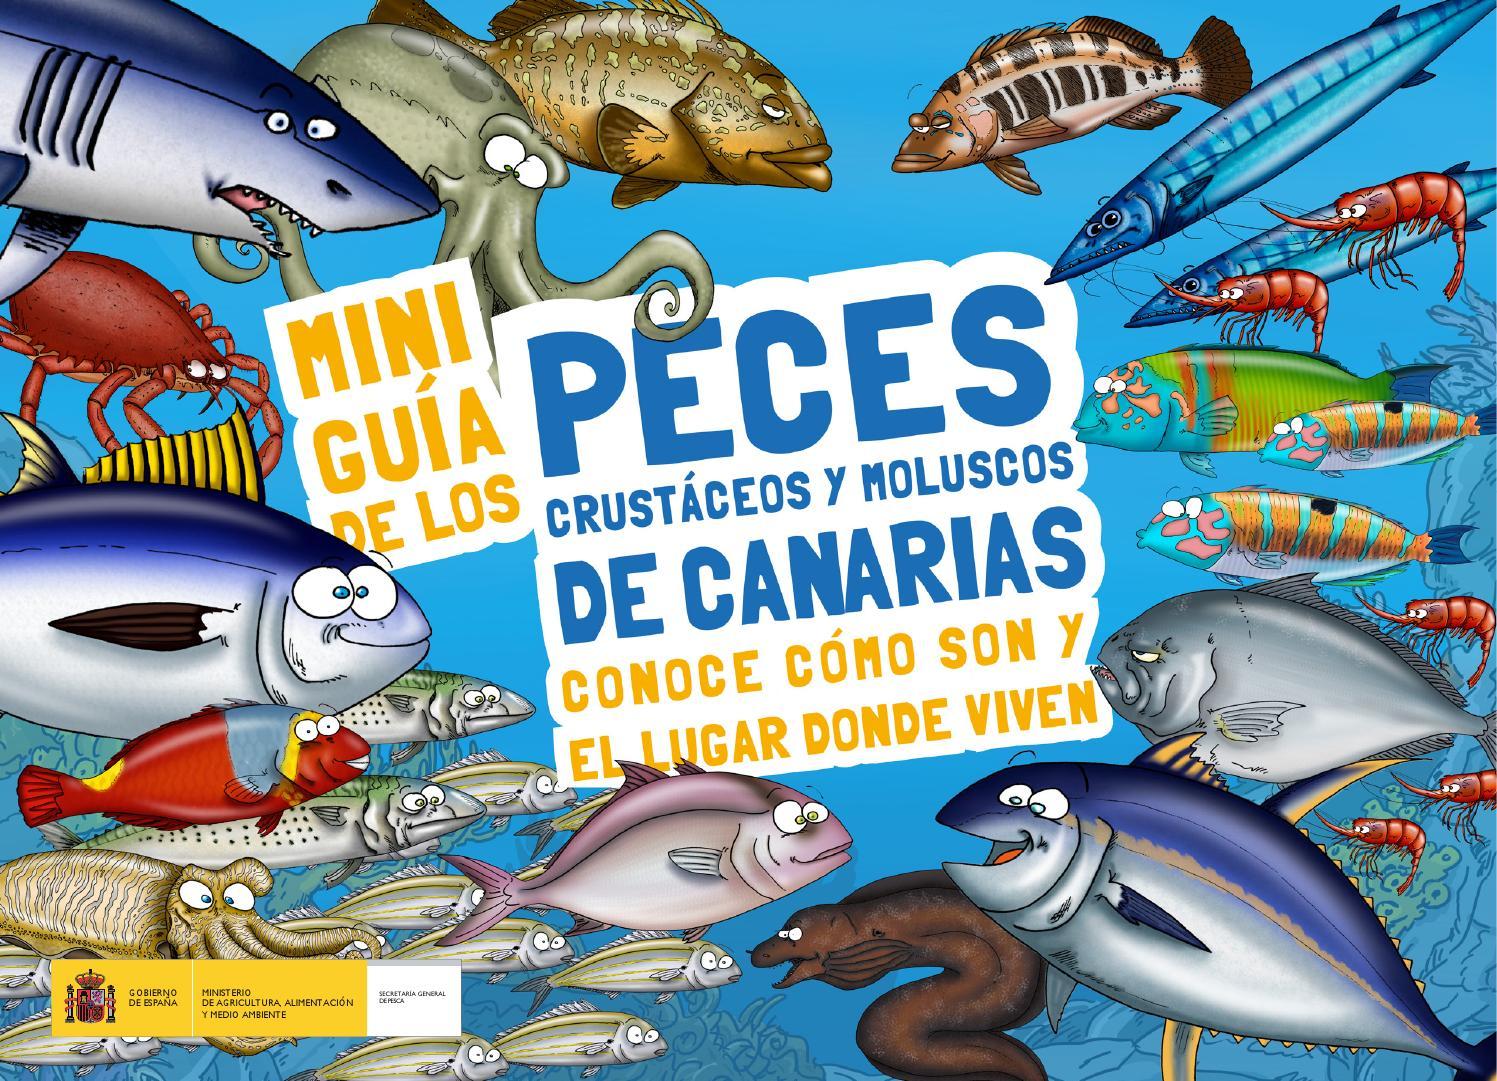 Miniguia de los peces. Oceanografíca by Matias Gutierrez - issuu